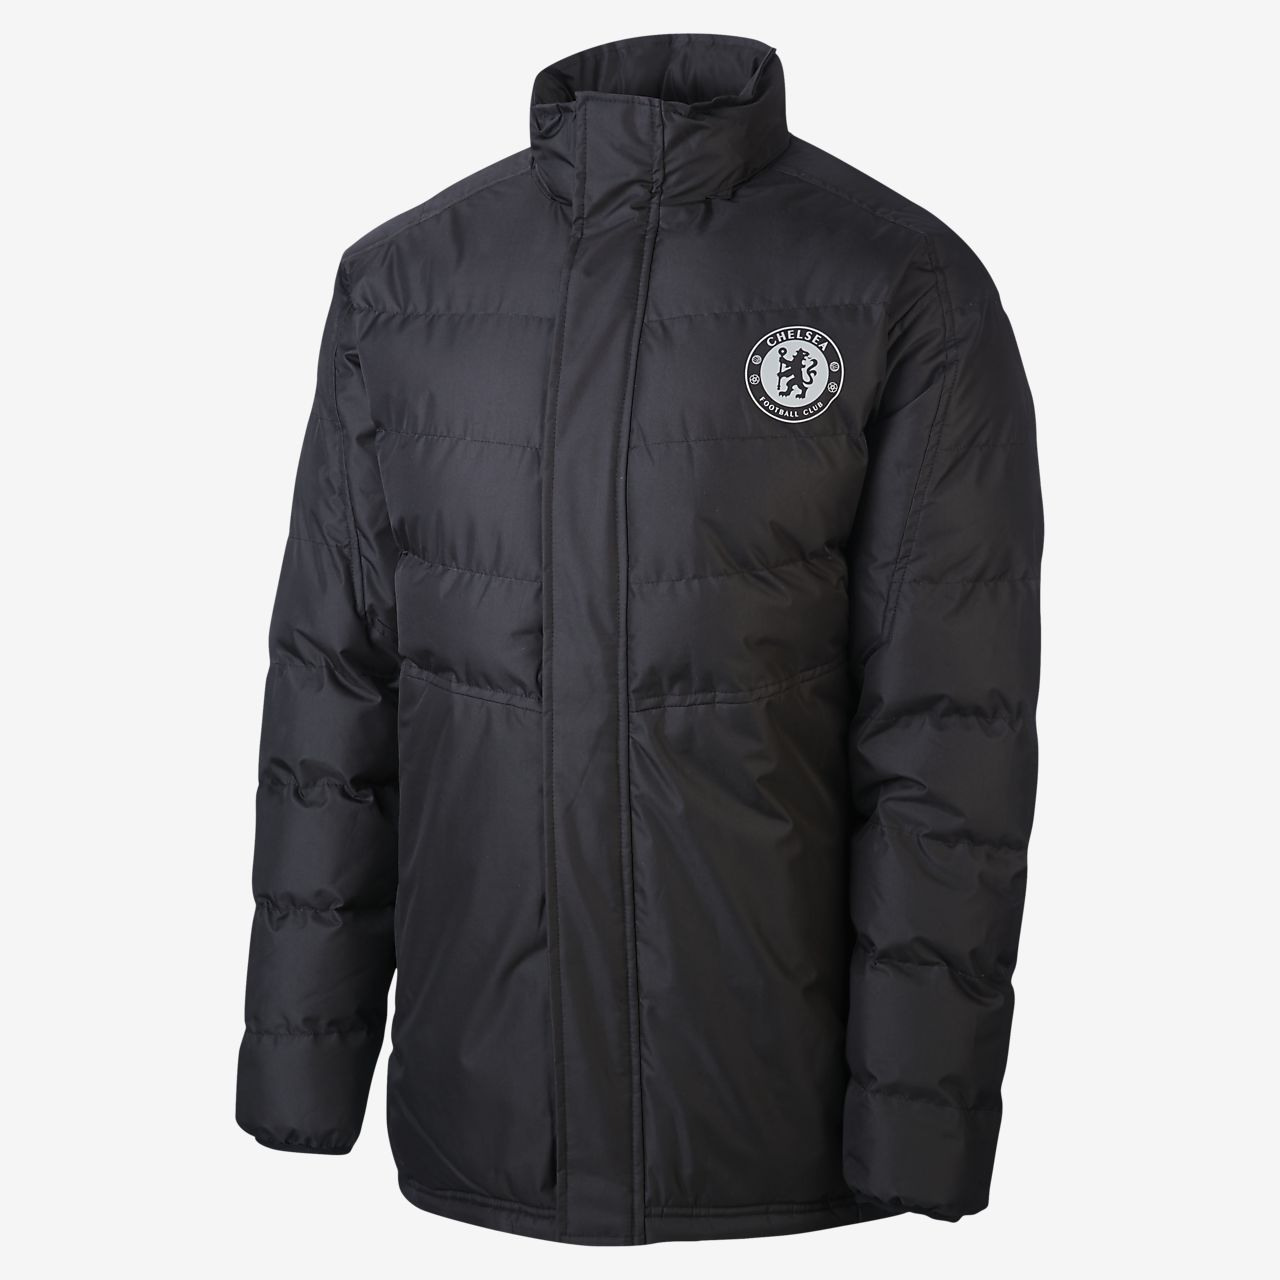 nike sportswear quilted jacket